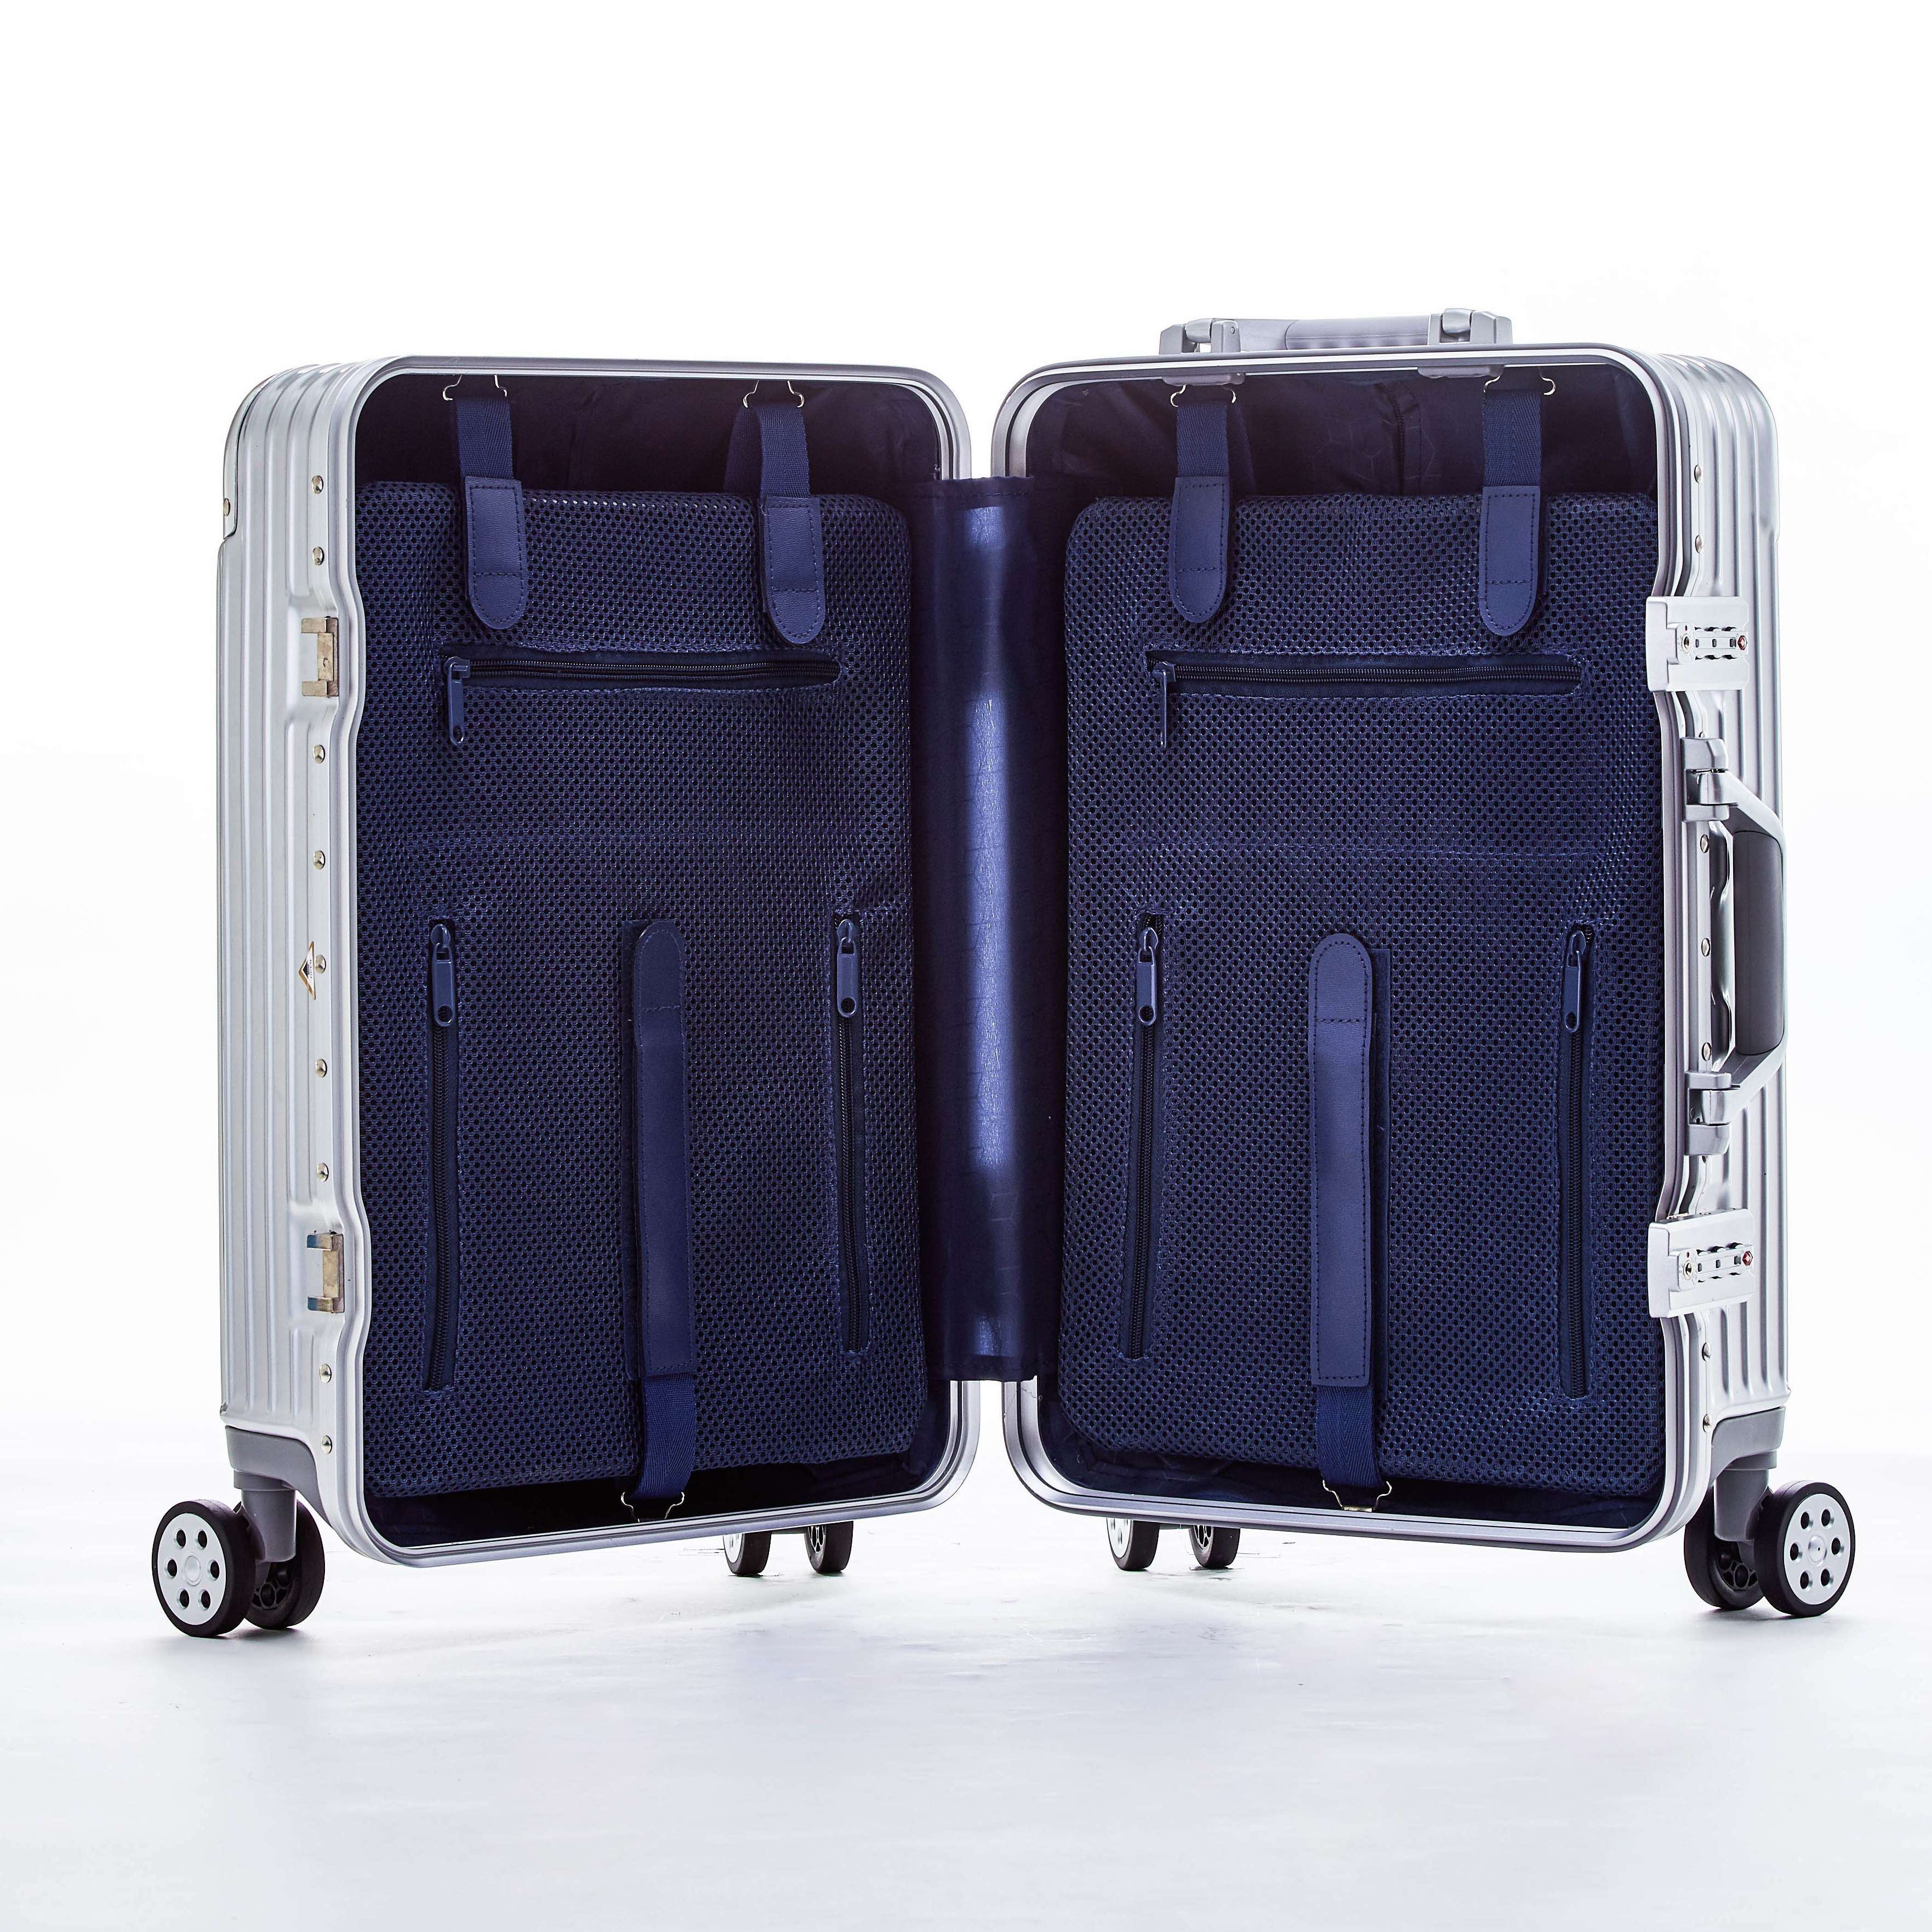 moof49,luggage,กระเป๋าเดินทาง,travel,trip,baggage,suitcase,Black,letsmoof,supportmoof49,travelwithmoof,กระเป๋า,กระเป๋าลาก,กระเป๋าเดินทางล้อลาก